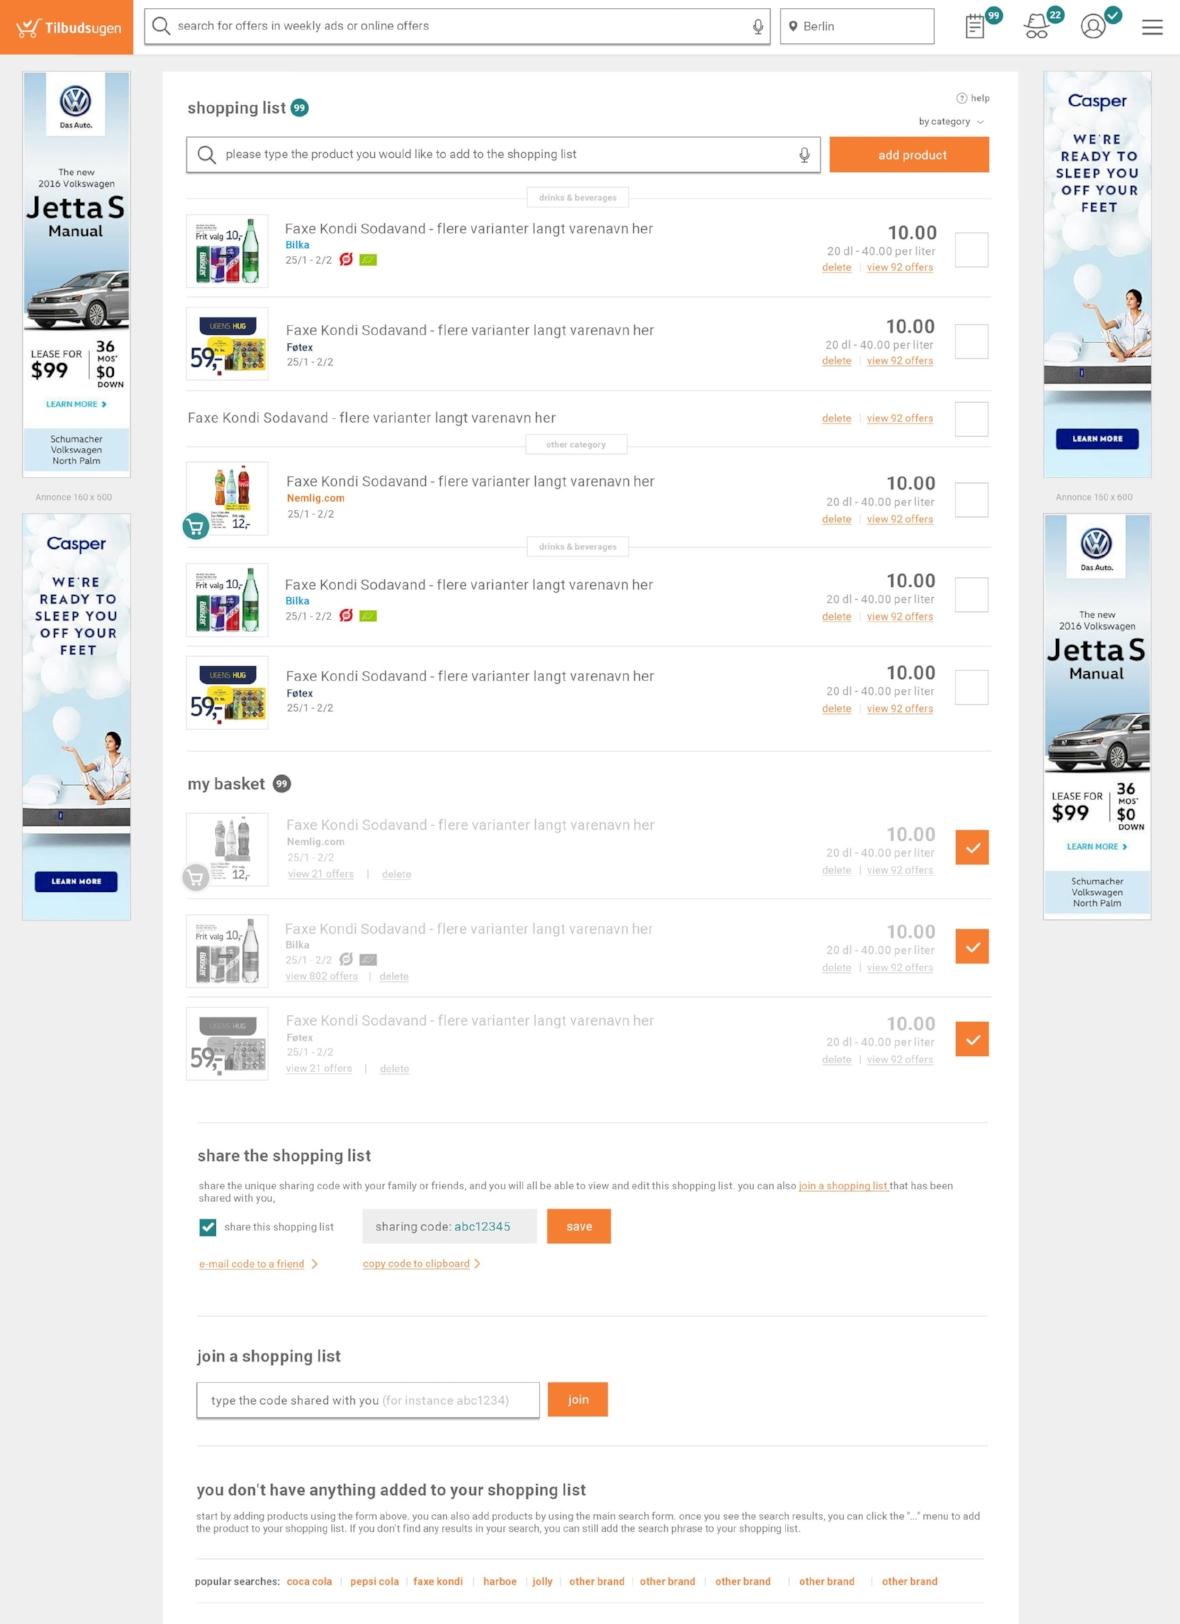 6.-Shopping-list.jpg